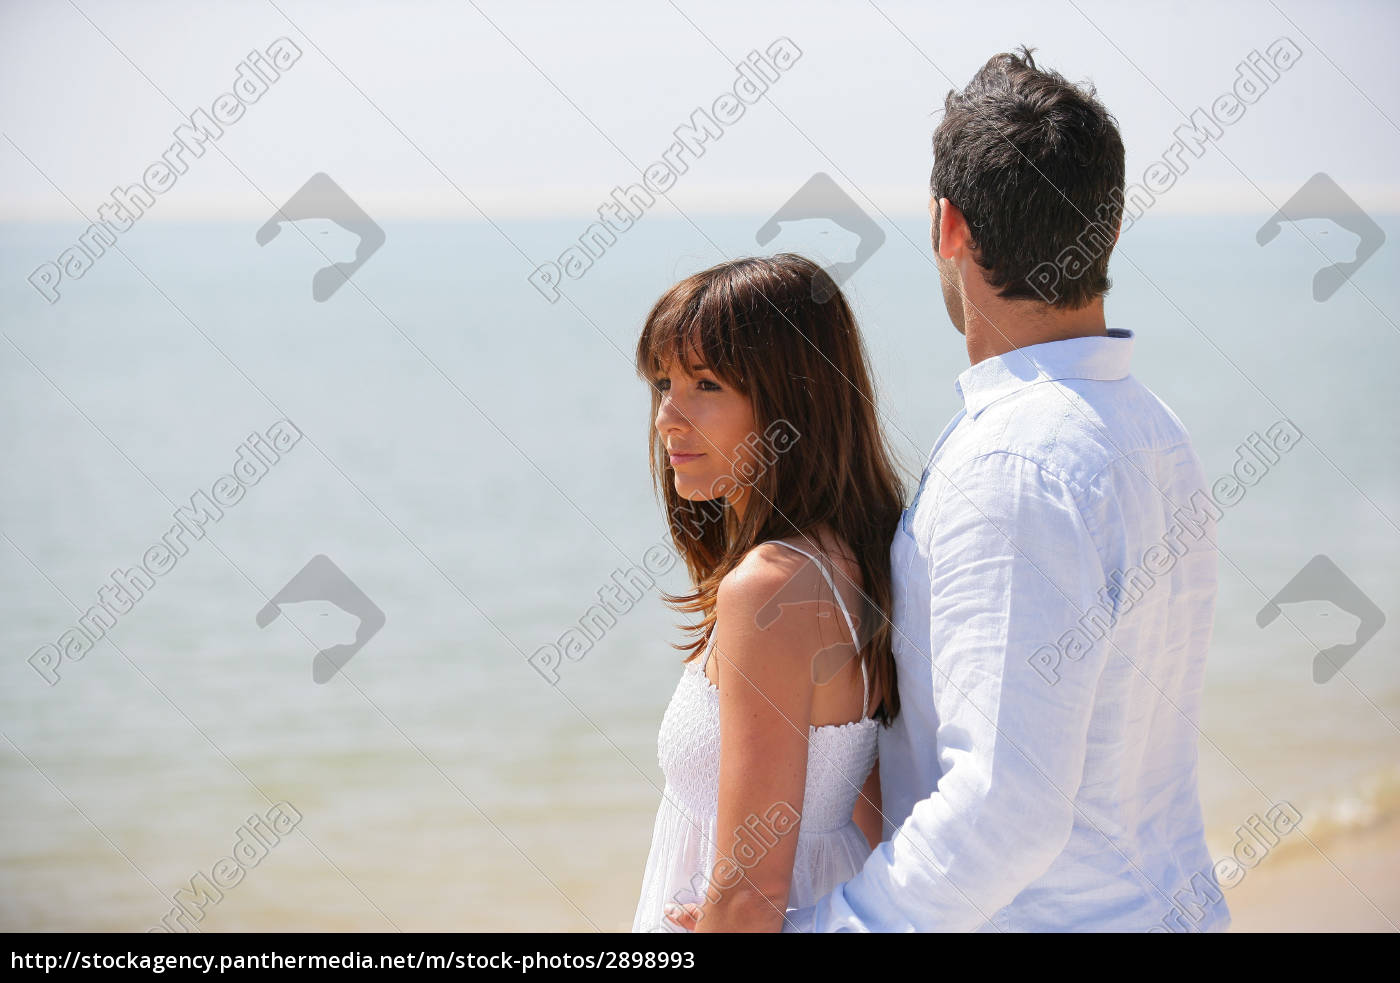 woman, profile, relaxation, romantic, beach, seaside - 2898993